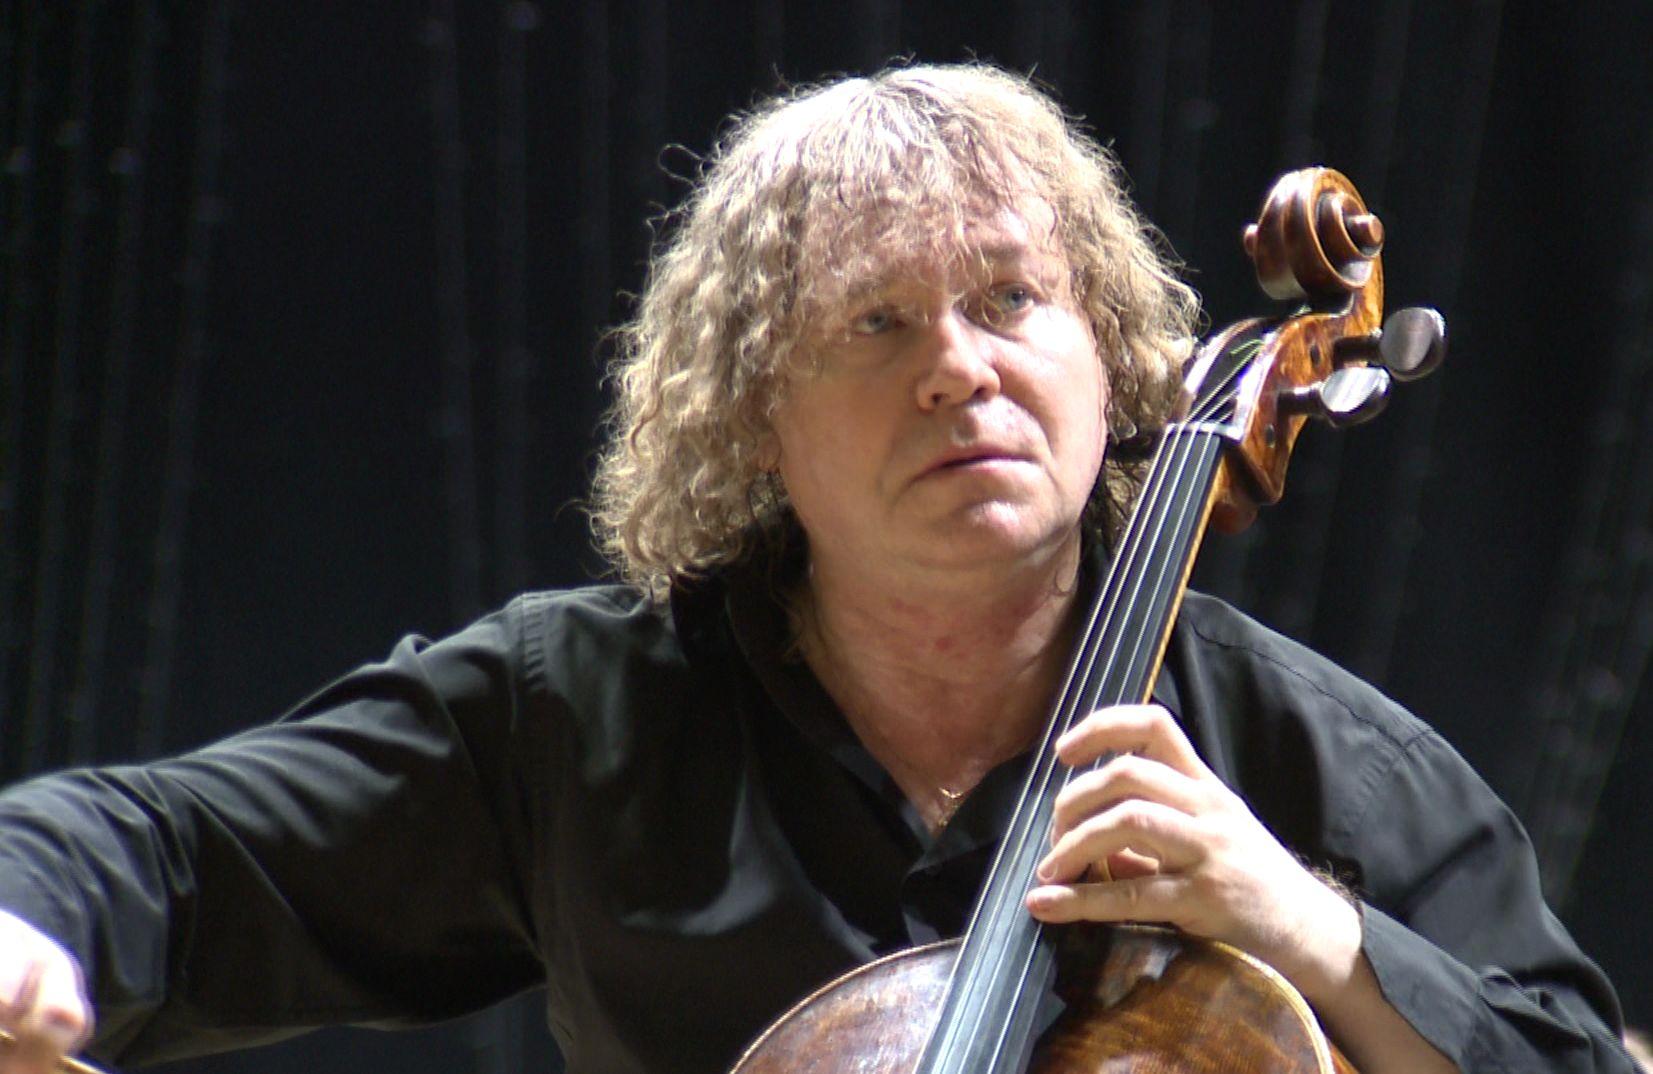 Александр Князев. Фото - Владимир Бобрецов